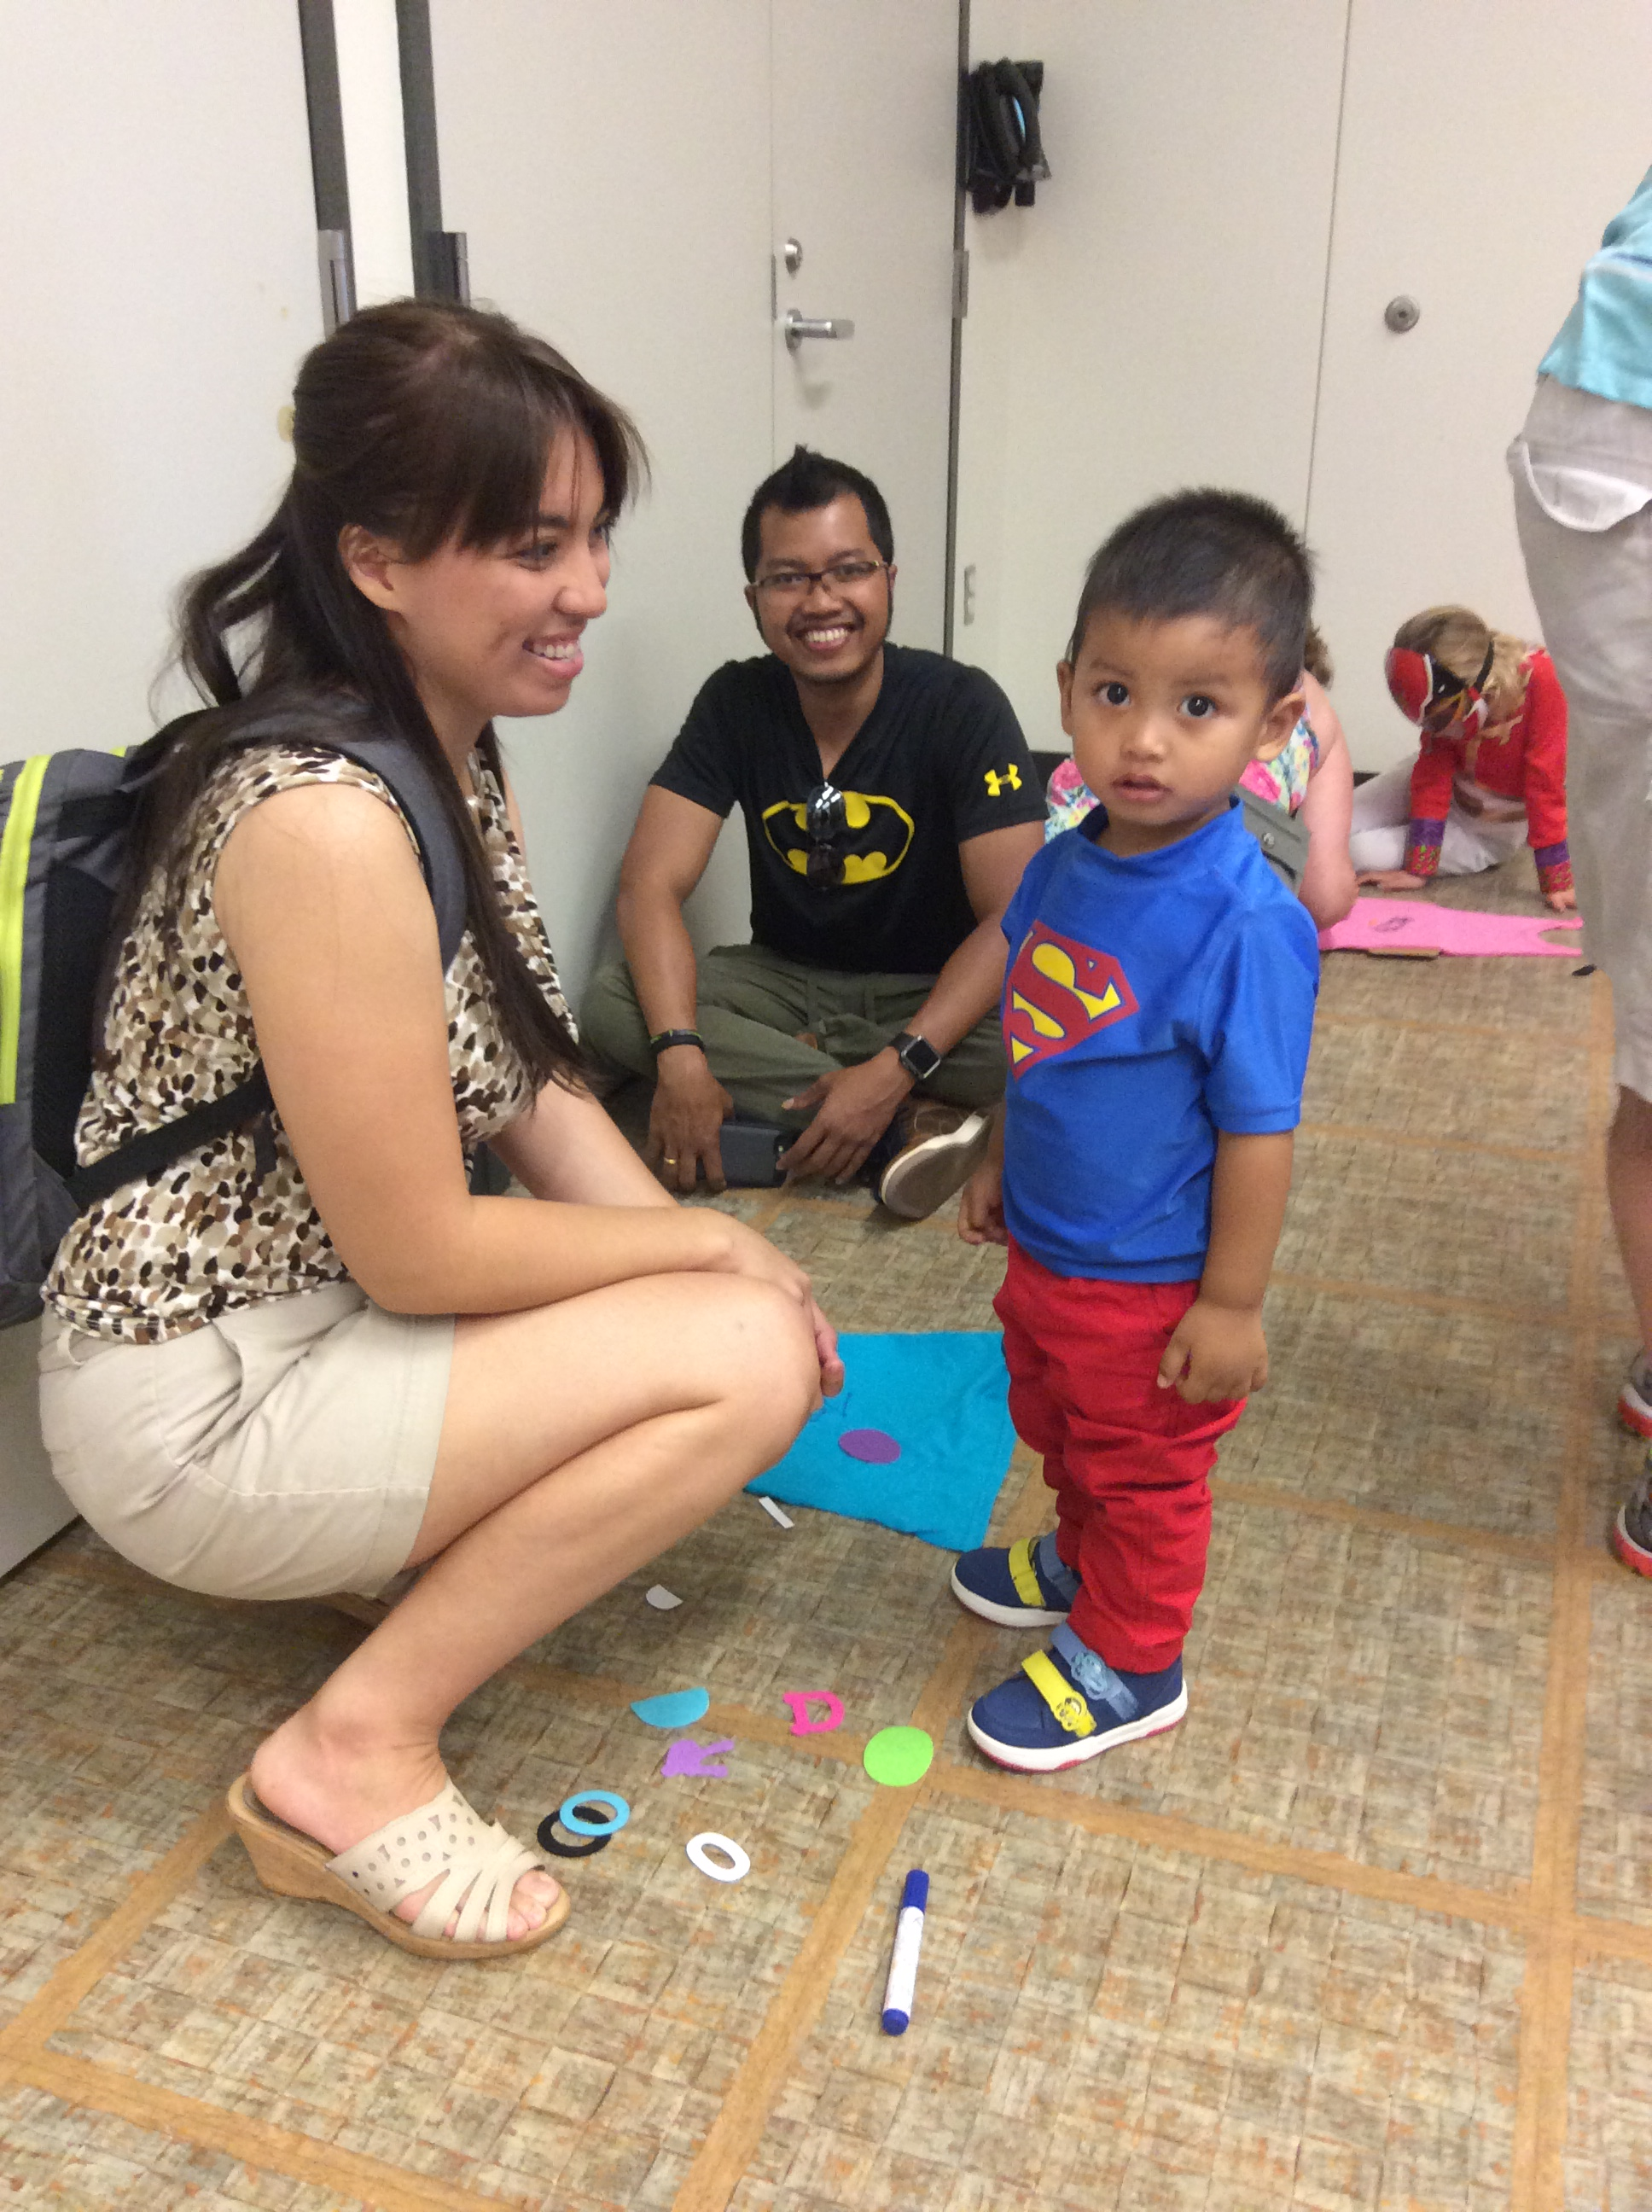 Superhero Party at Oshtemo 265 (20519861625).jpg English: Superhero Party at Oshtemo Branch Library, August 10, 2015. Photos by Mary Wischman